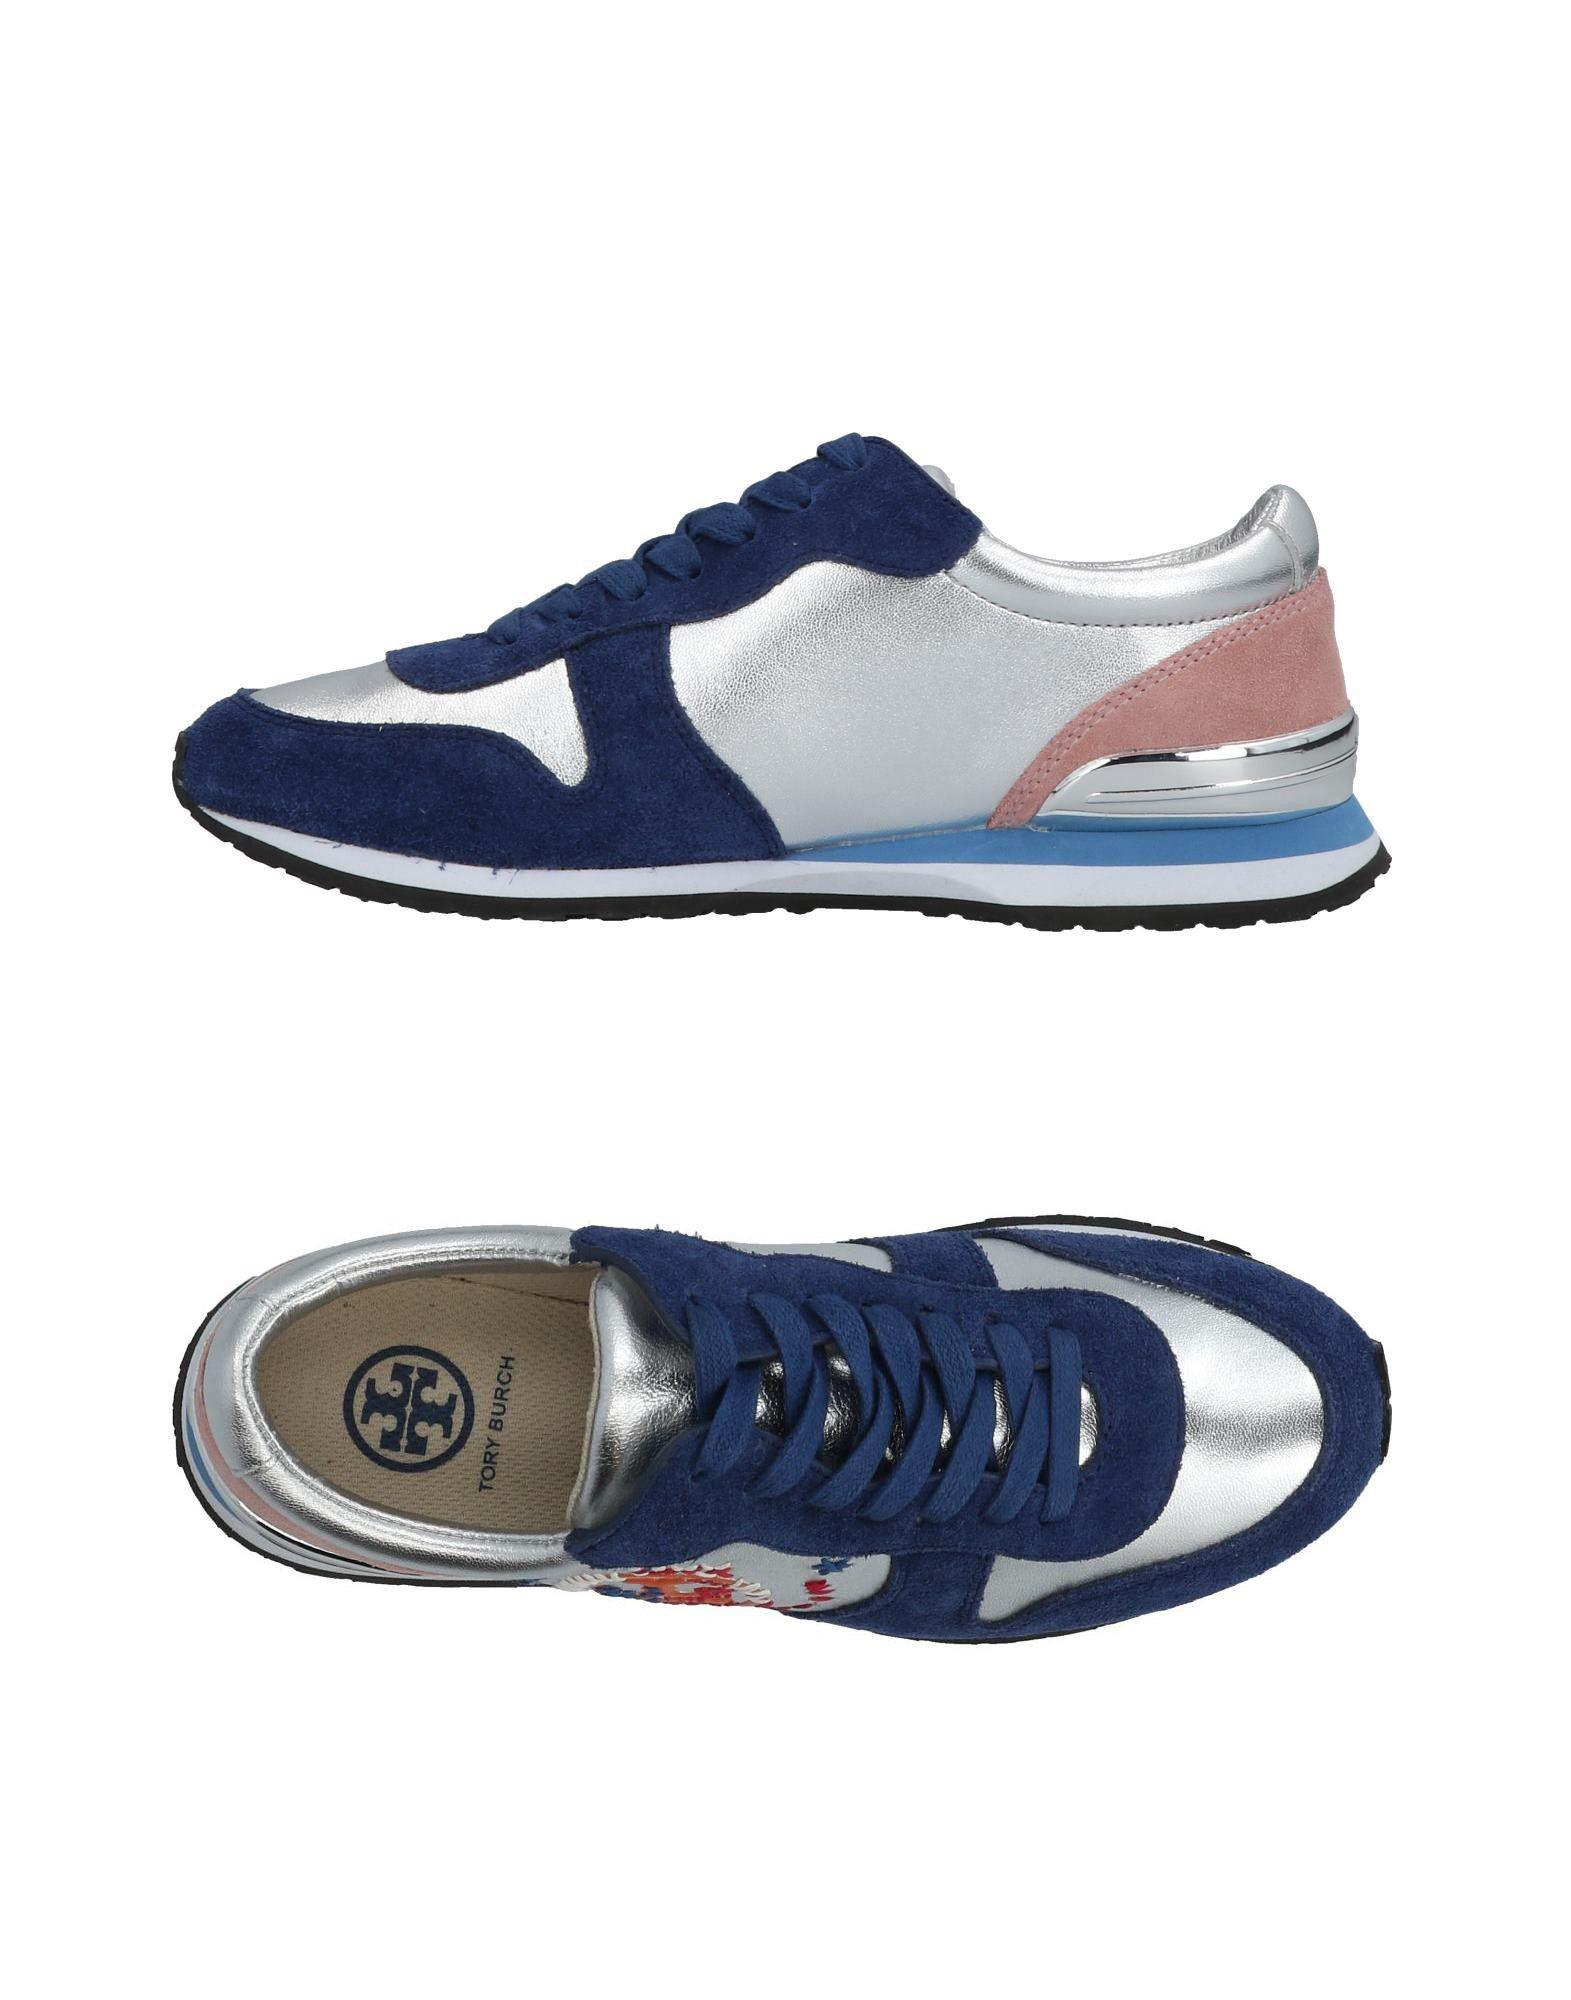 8bbaff938c84 Tory Burch - Metallic Low-tops   Sneakers - Lyst. View fullscreen